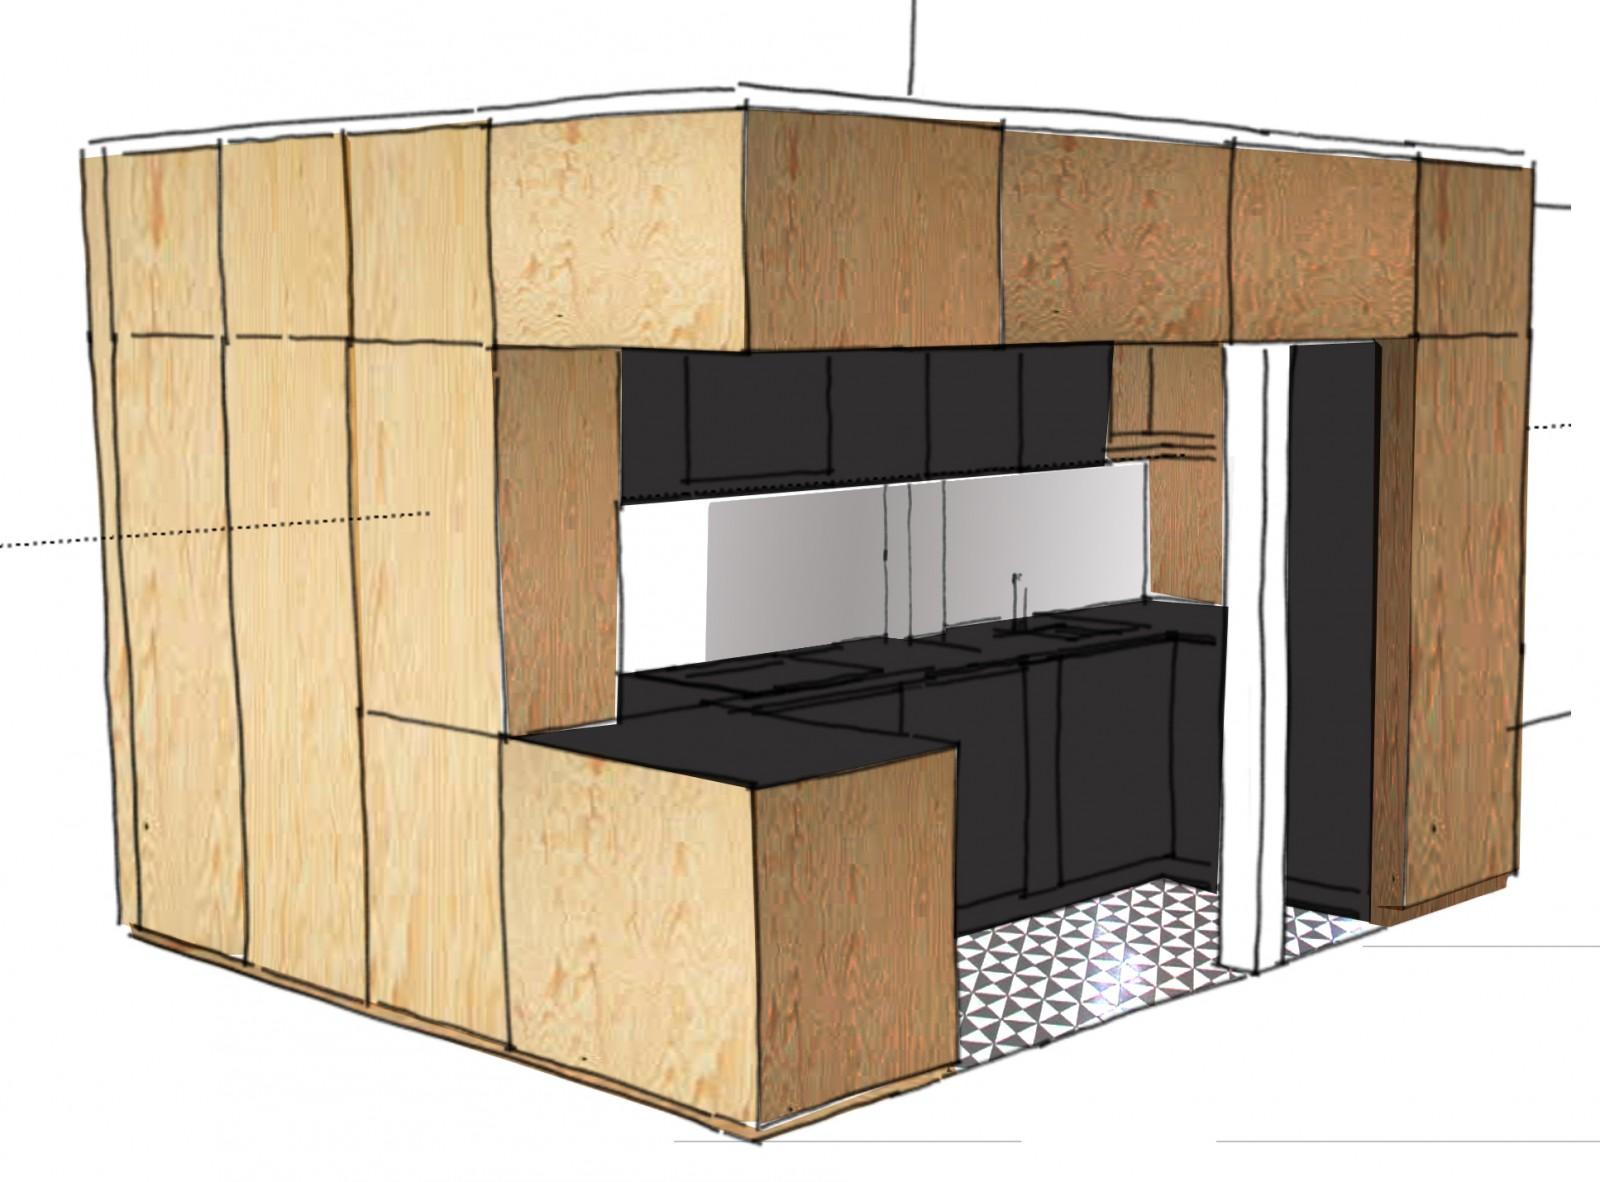 rooftop 3D concept